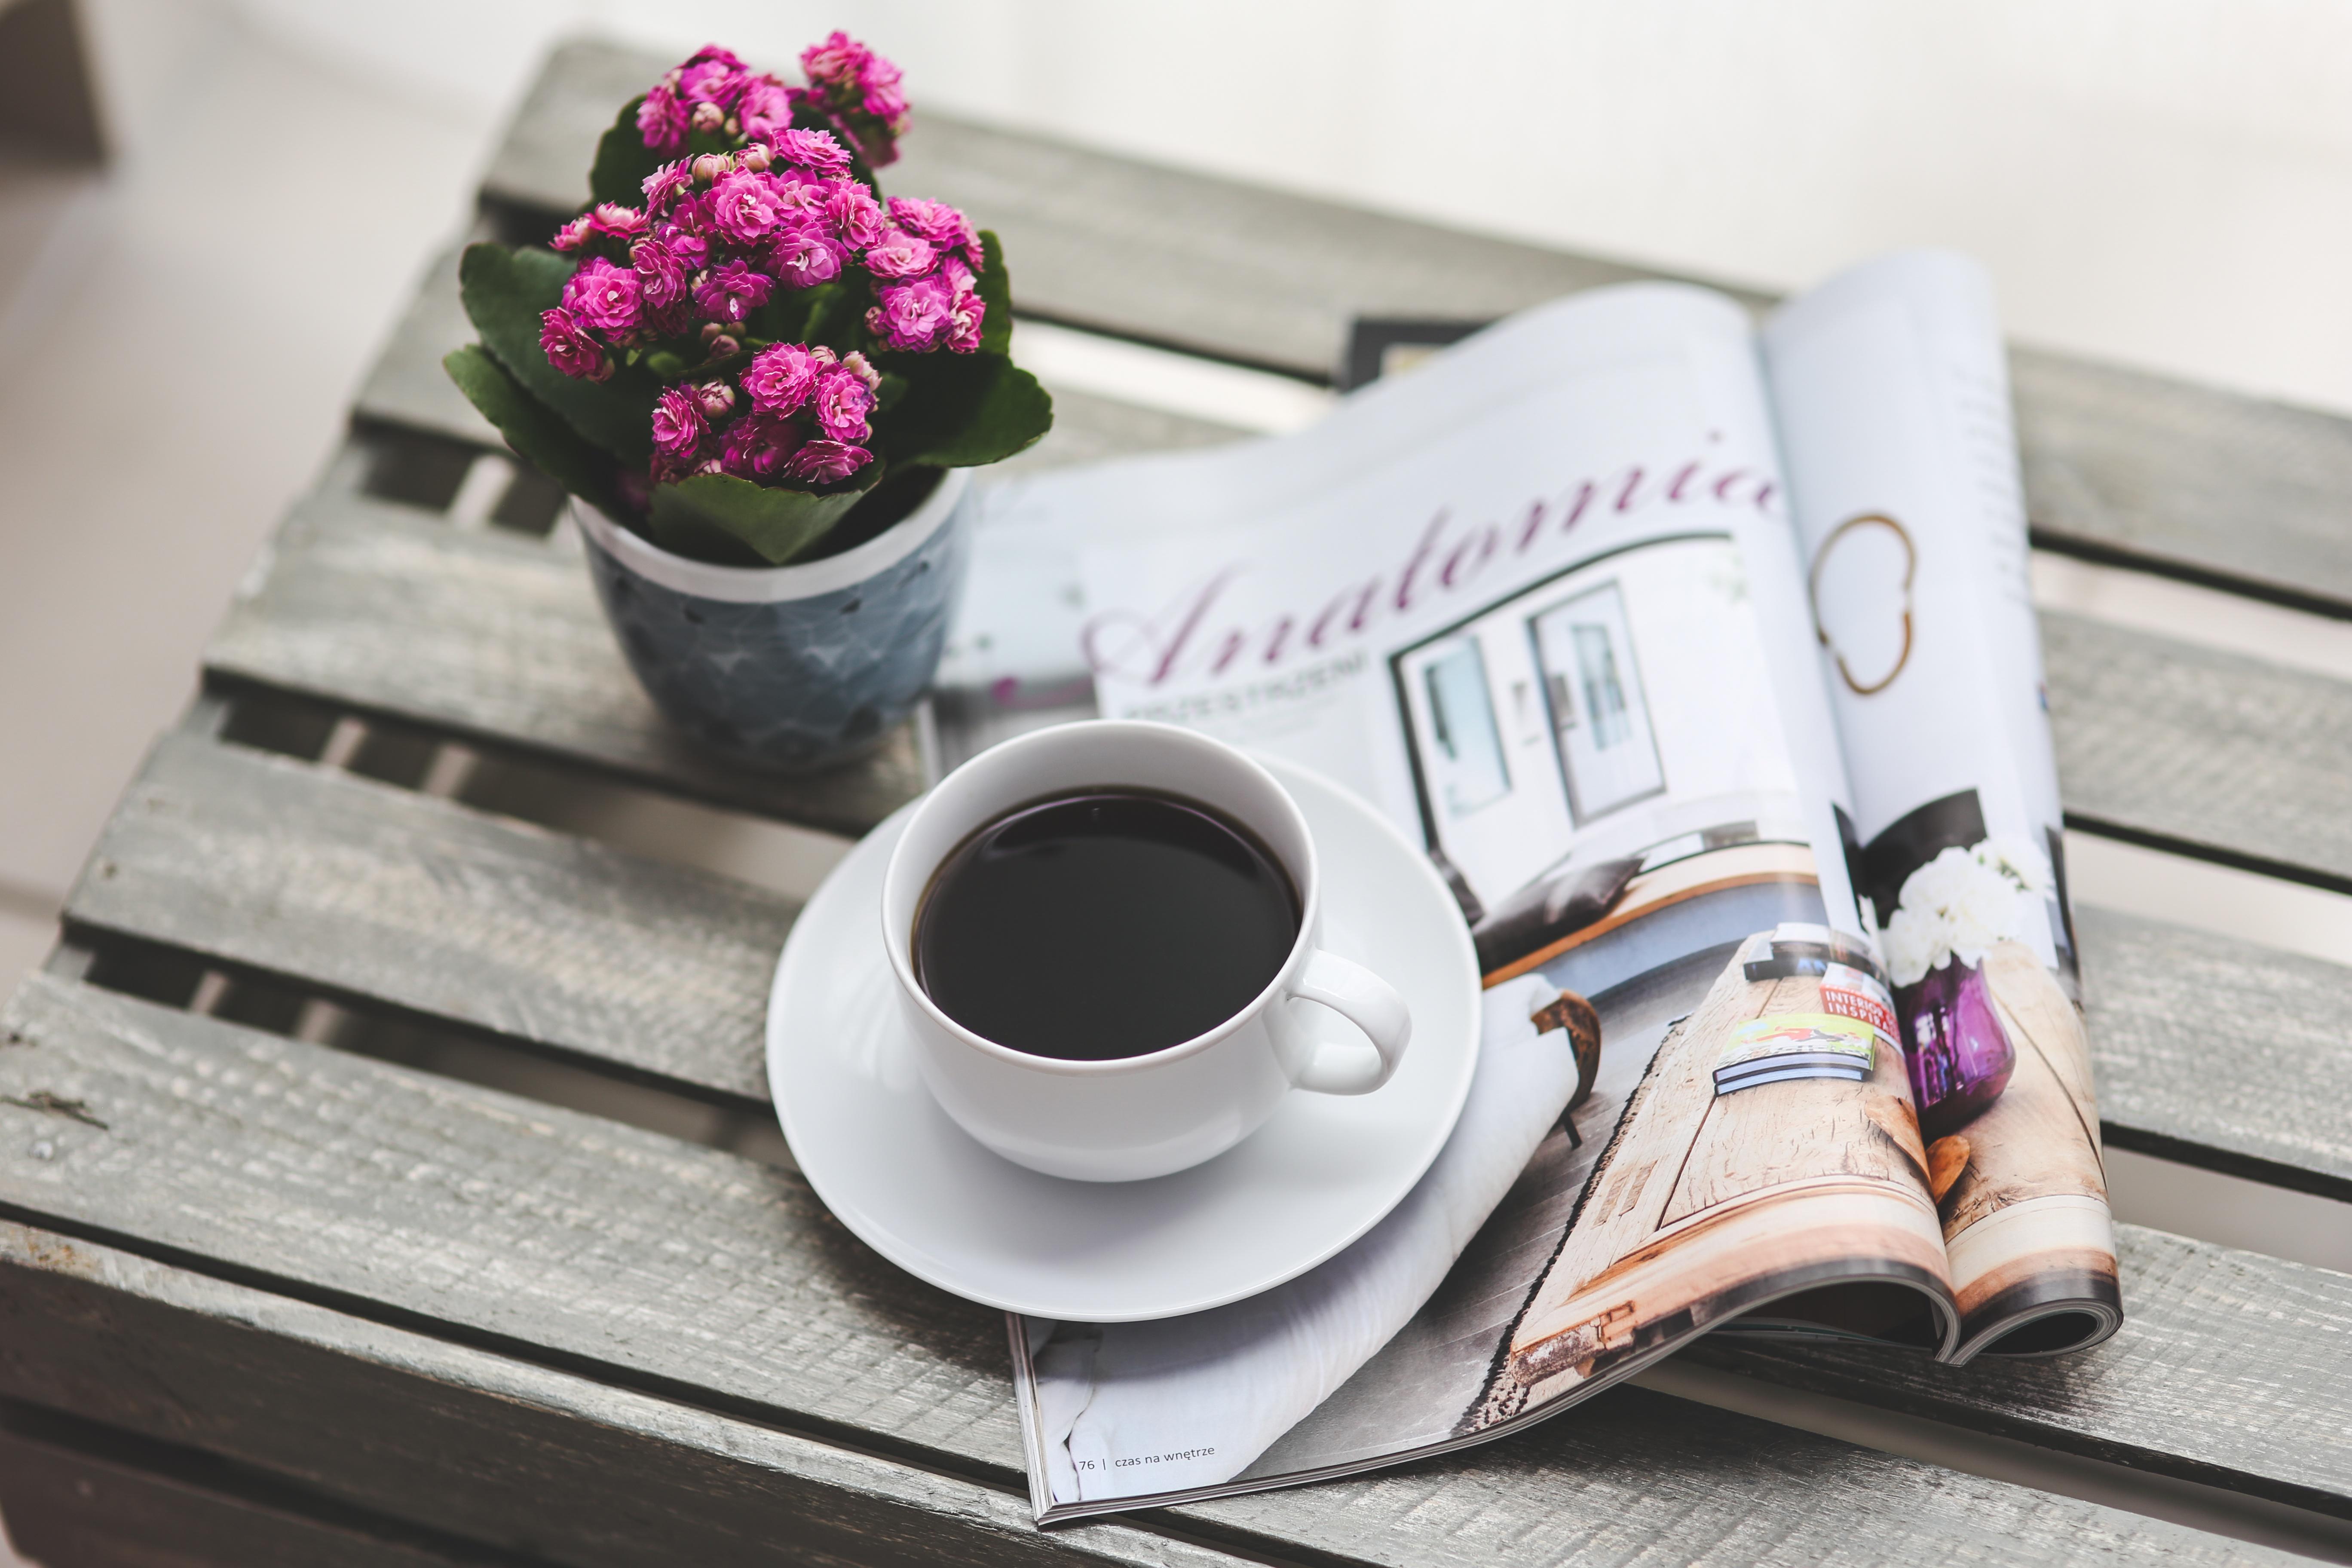 coffee-flower-reading-magazine_SP.jpg